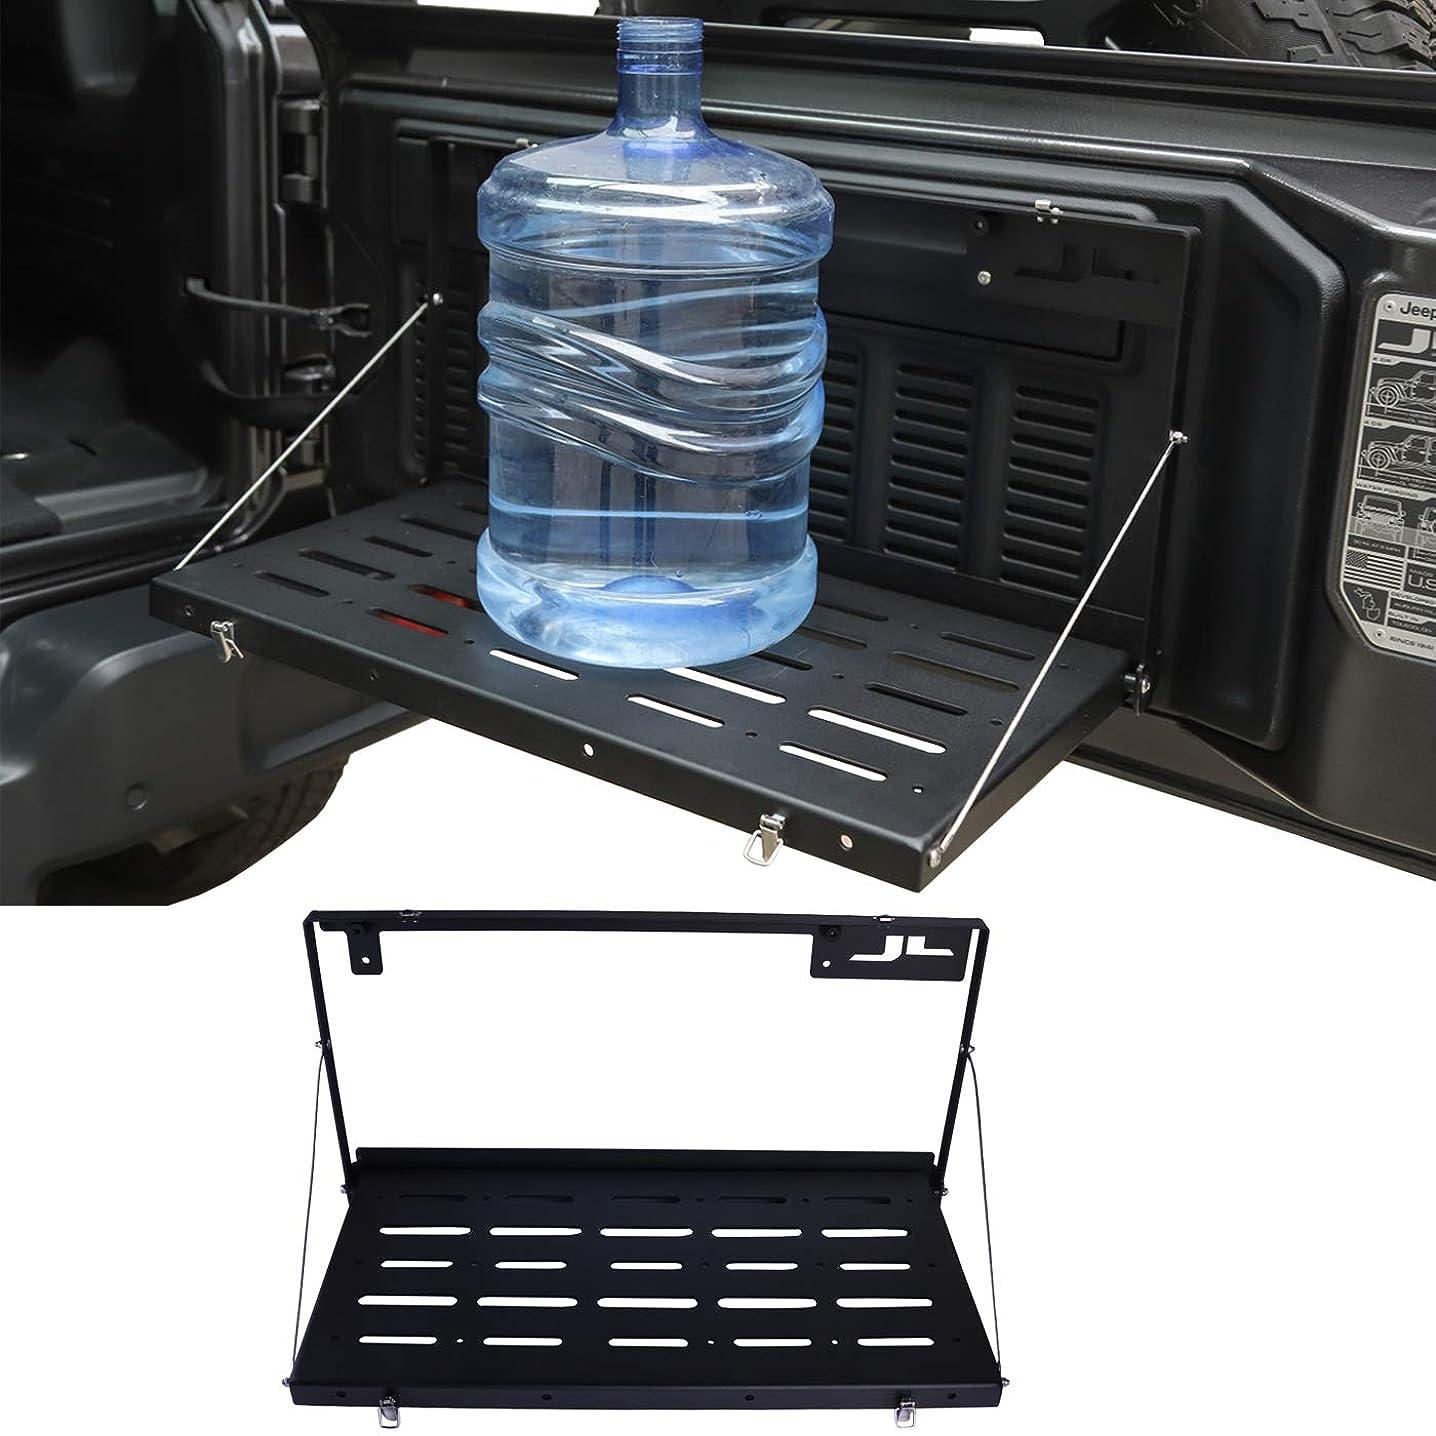 omotor Jeep Wrangler JL Tailgate Table JL Rear Door Table Storage Cargo Shelf Rack Aluminum Alloy Matte Black Rear Foldable Back Shelf fit for Jeep Wrangler JL JLU (Instruction Include)